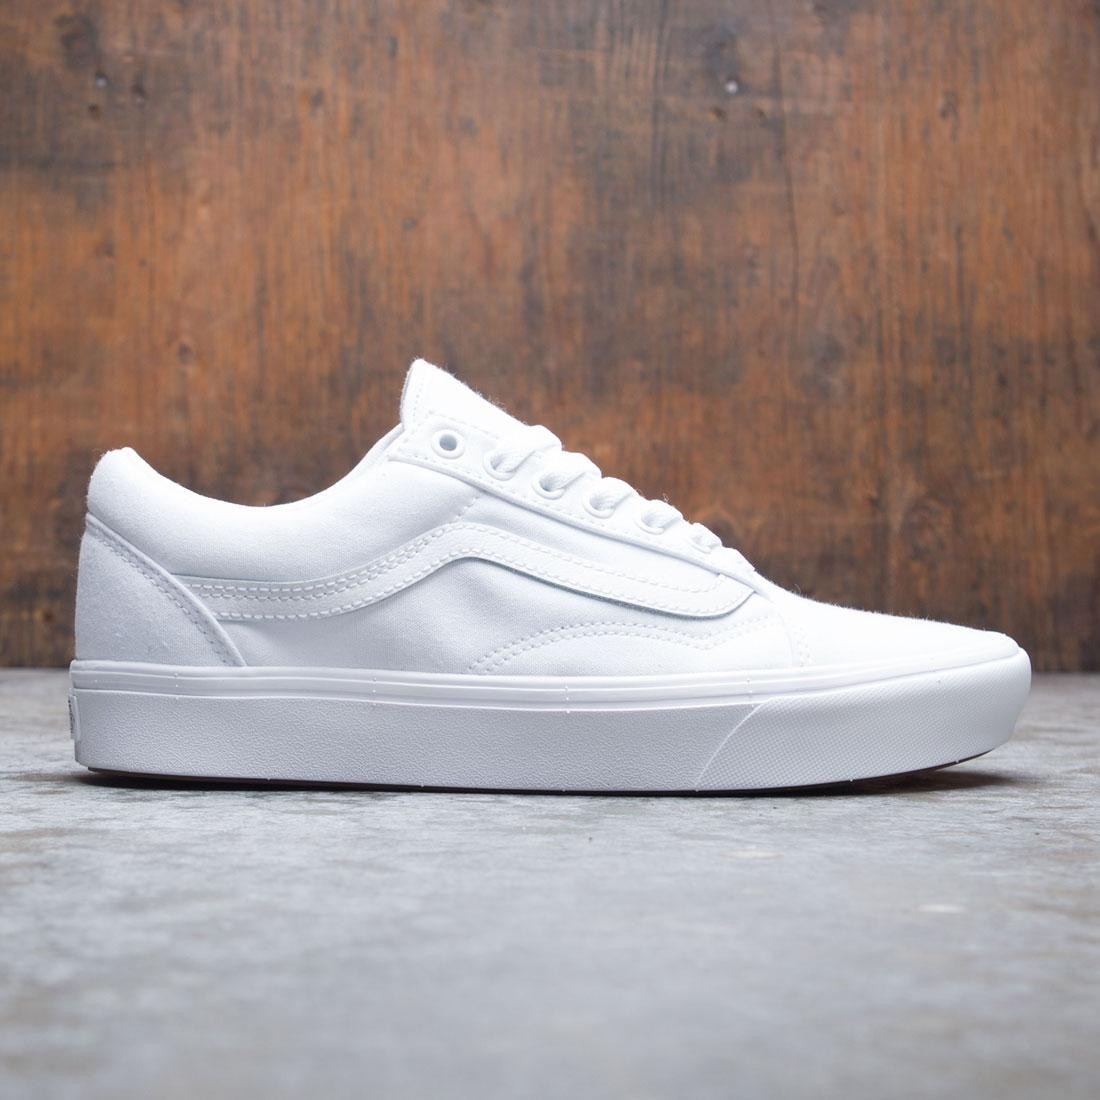 Vans Men Old Skool - Comfy Cush white